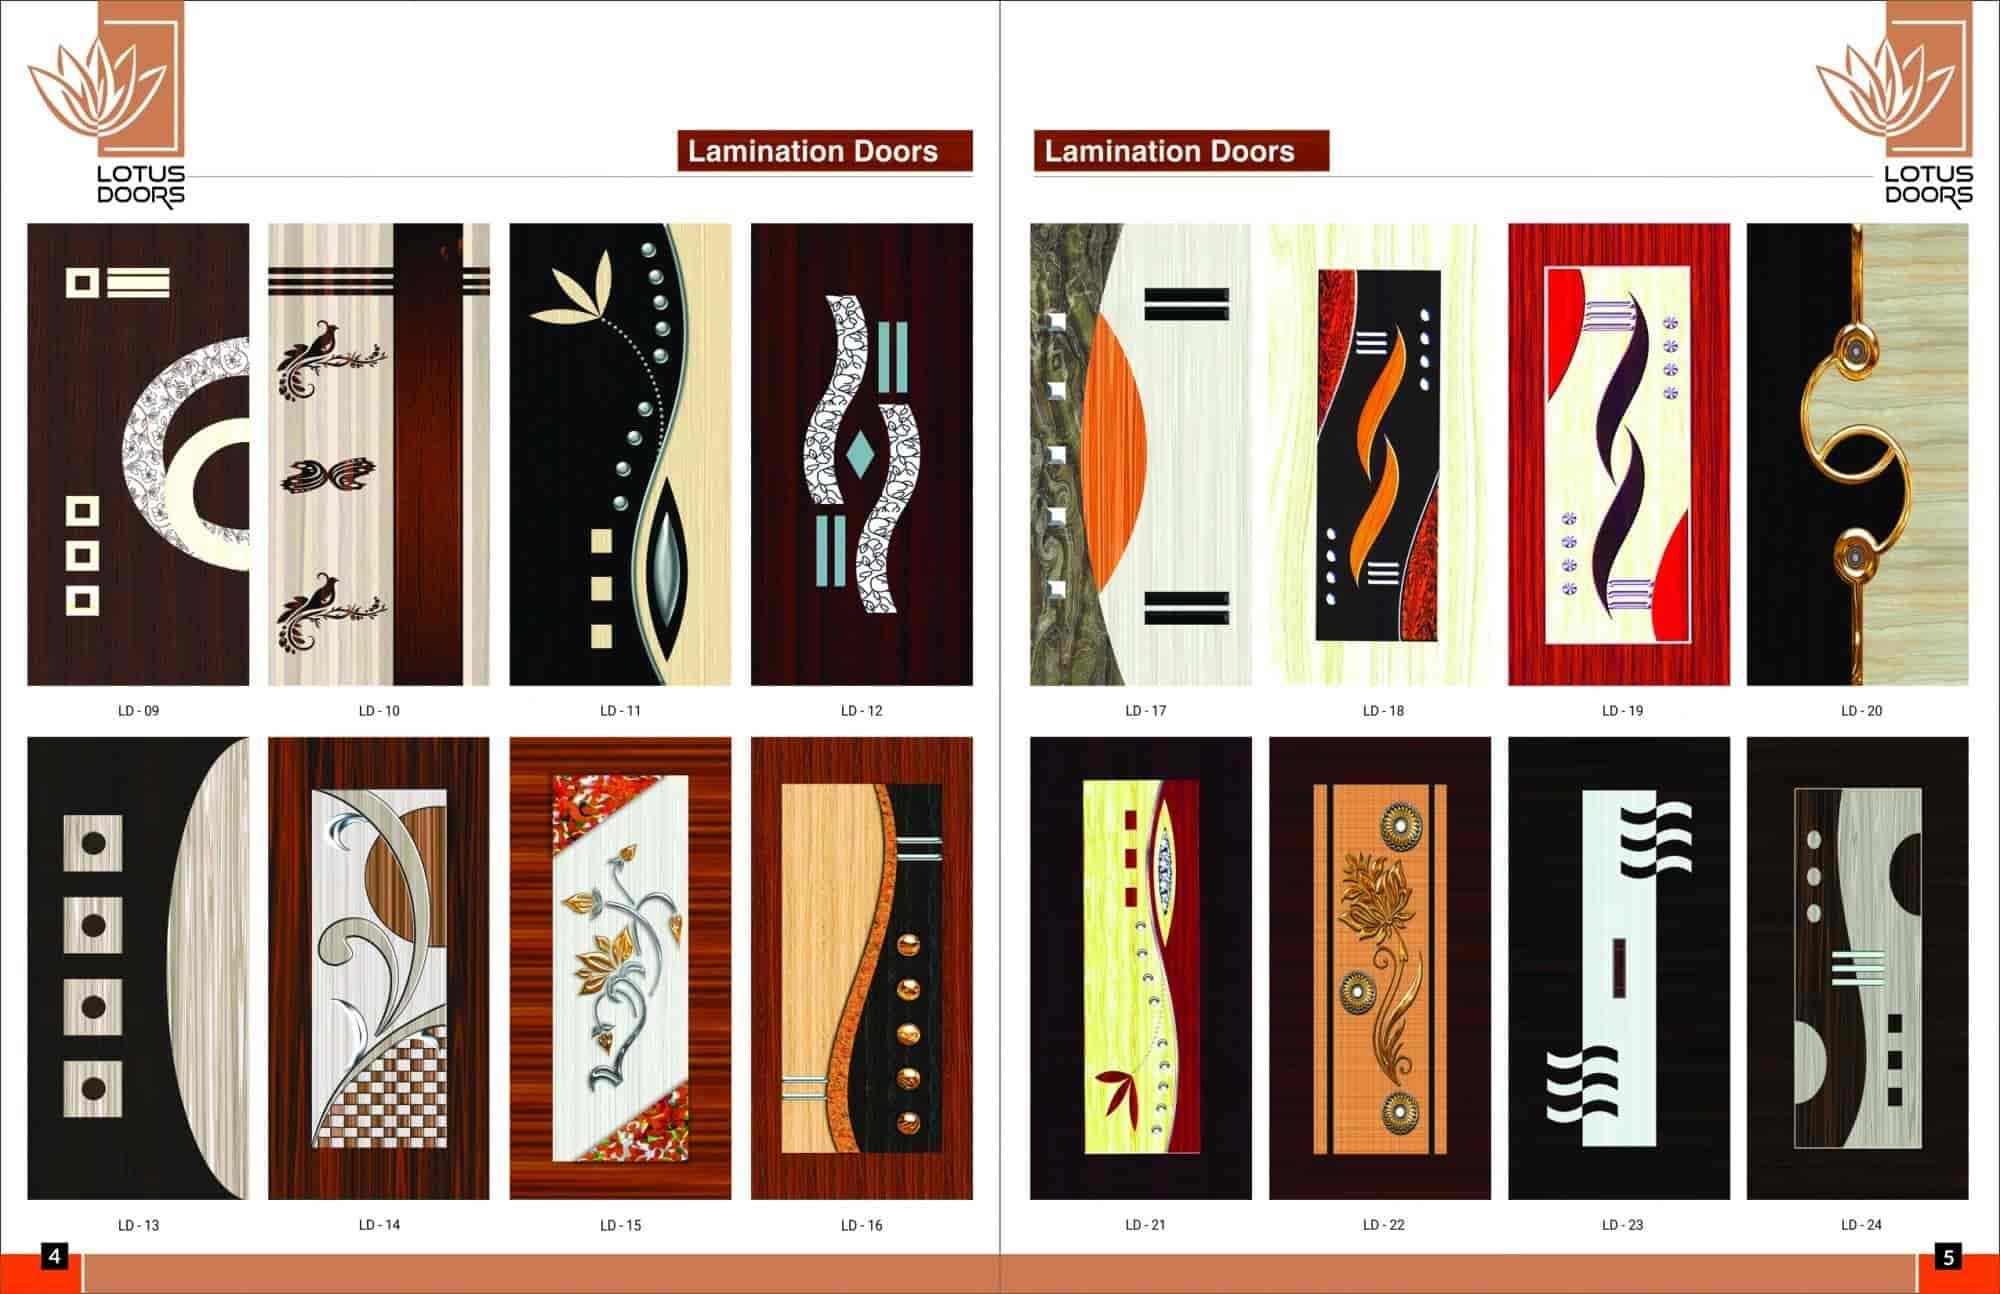 ... Product Catalog - Lotus Doors Photos Hinjawadi Pune - Laminated Door Dealers & Lotus Doors Photos Hinjawadi Pune- Pictures u0026 Images Gallery ...